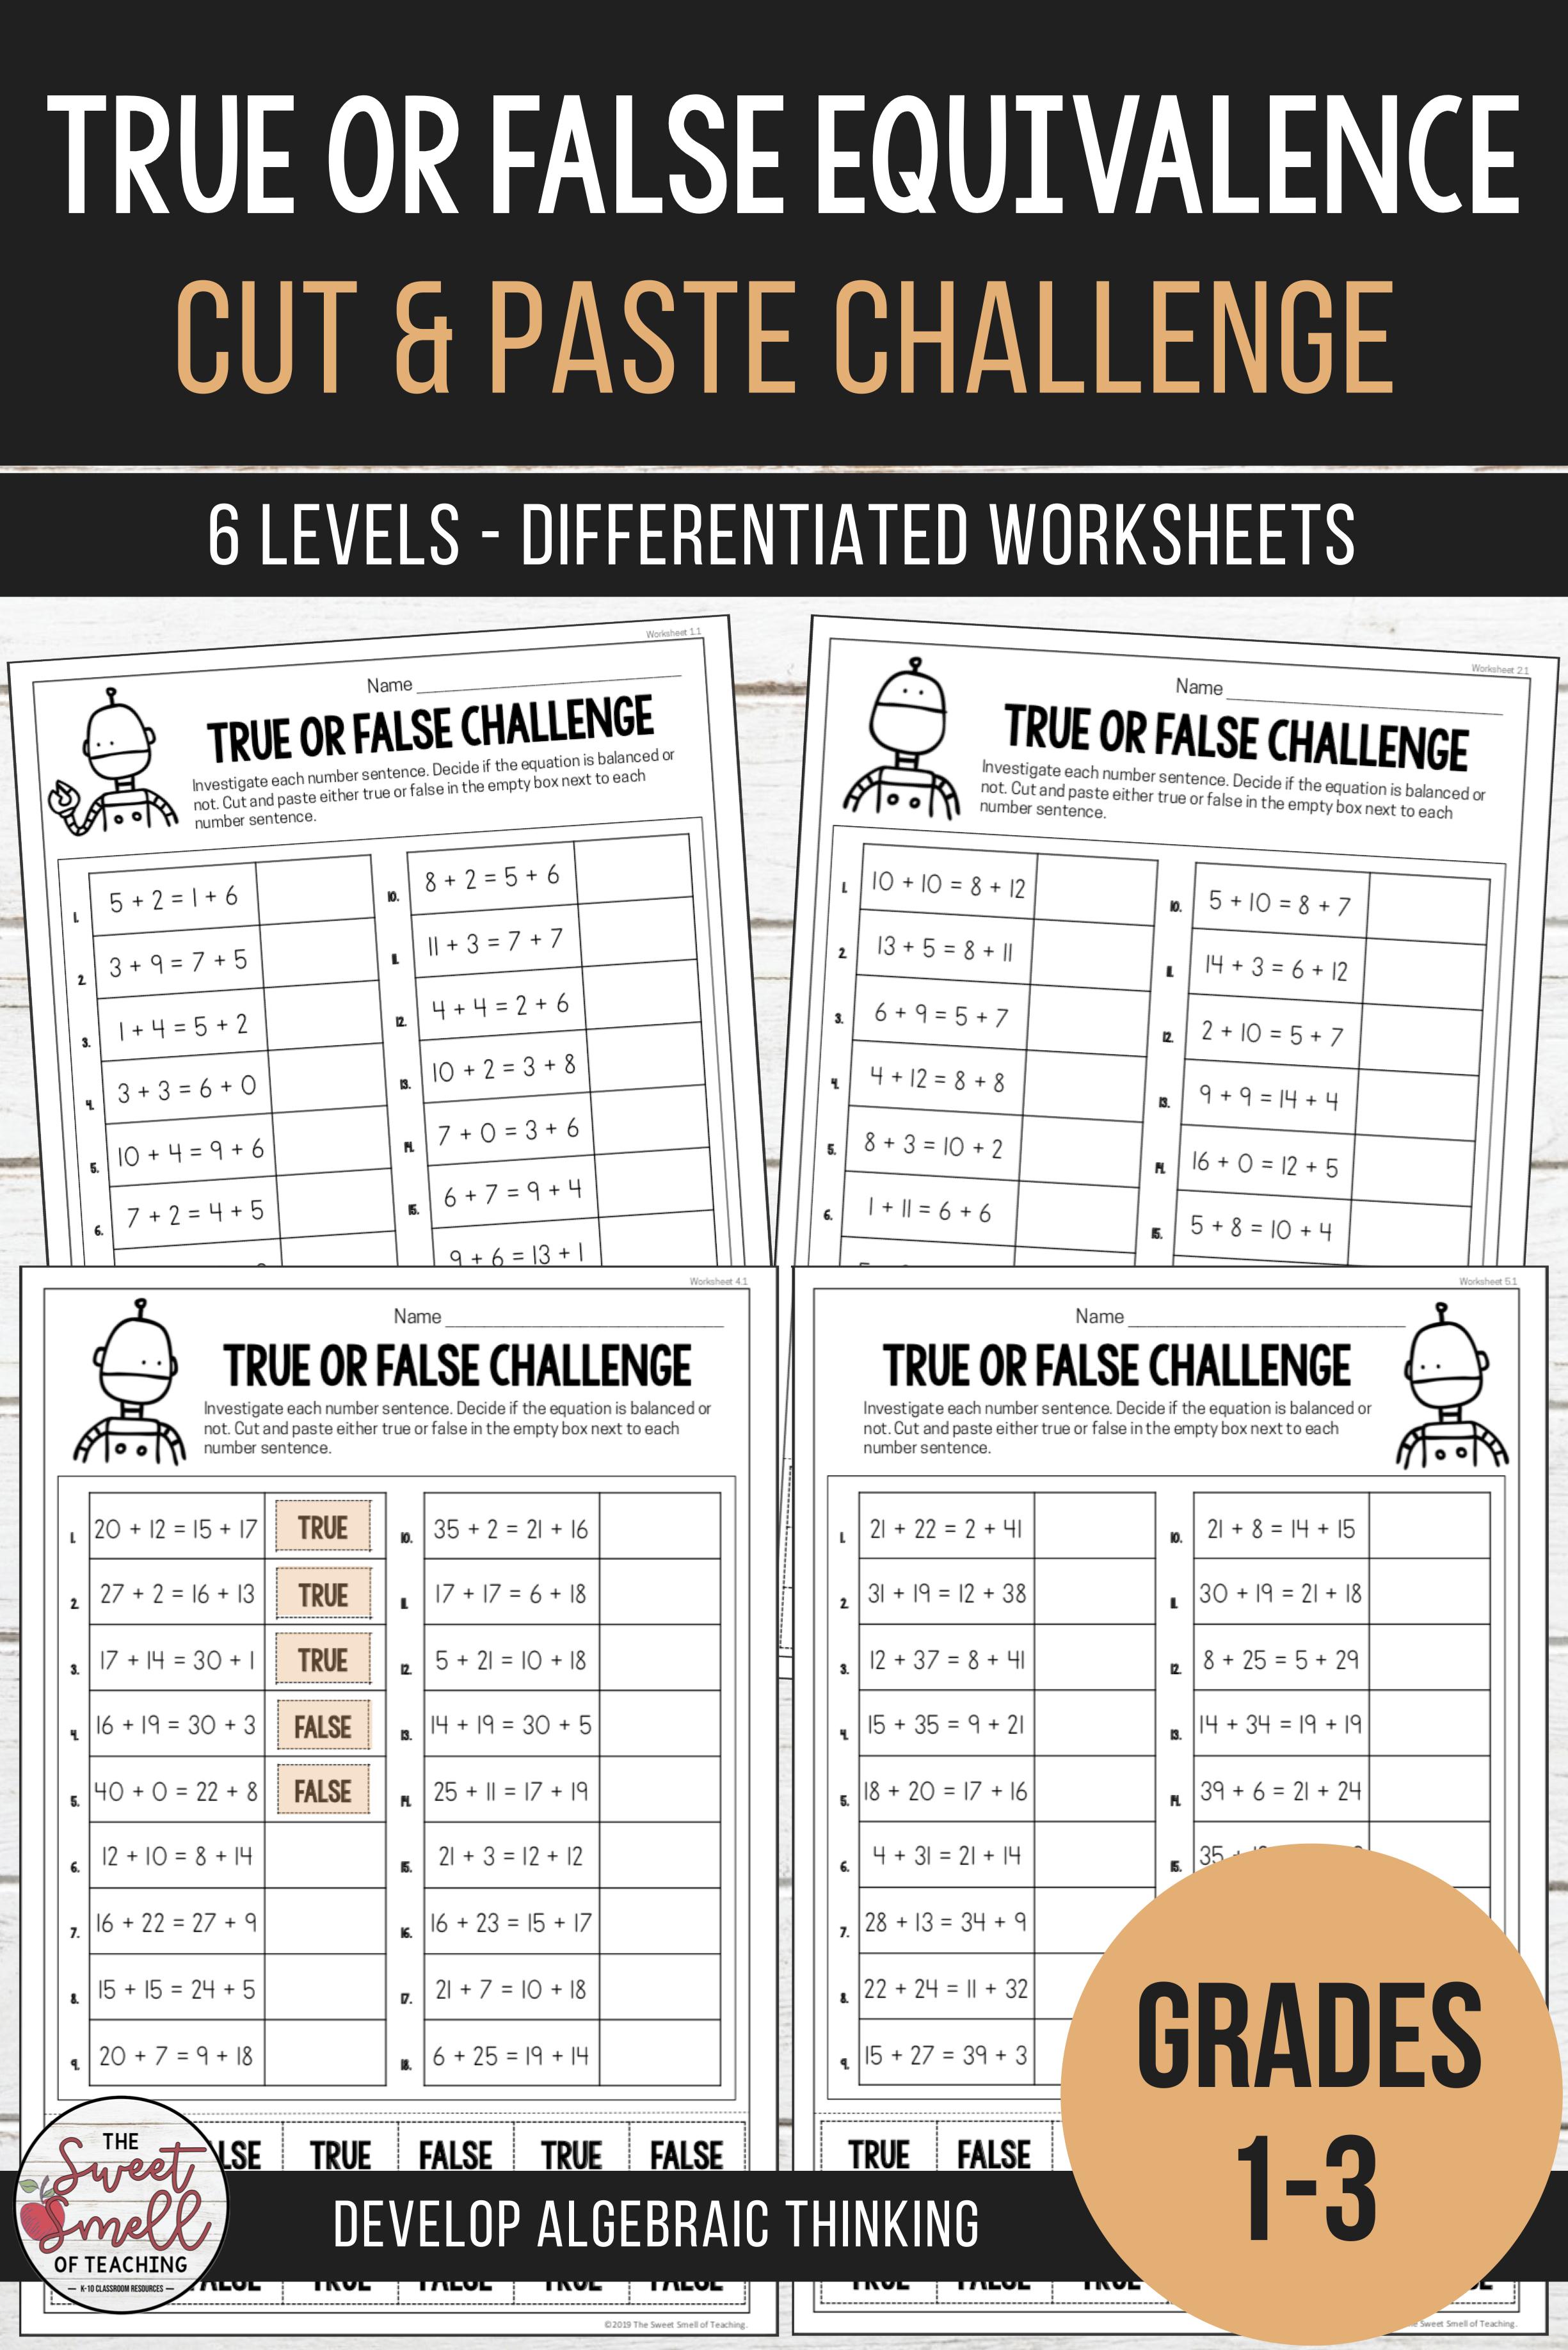 Balancing Equations True or False Equivalence Worksheets